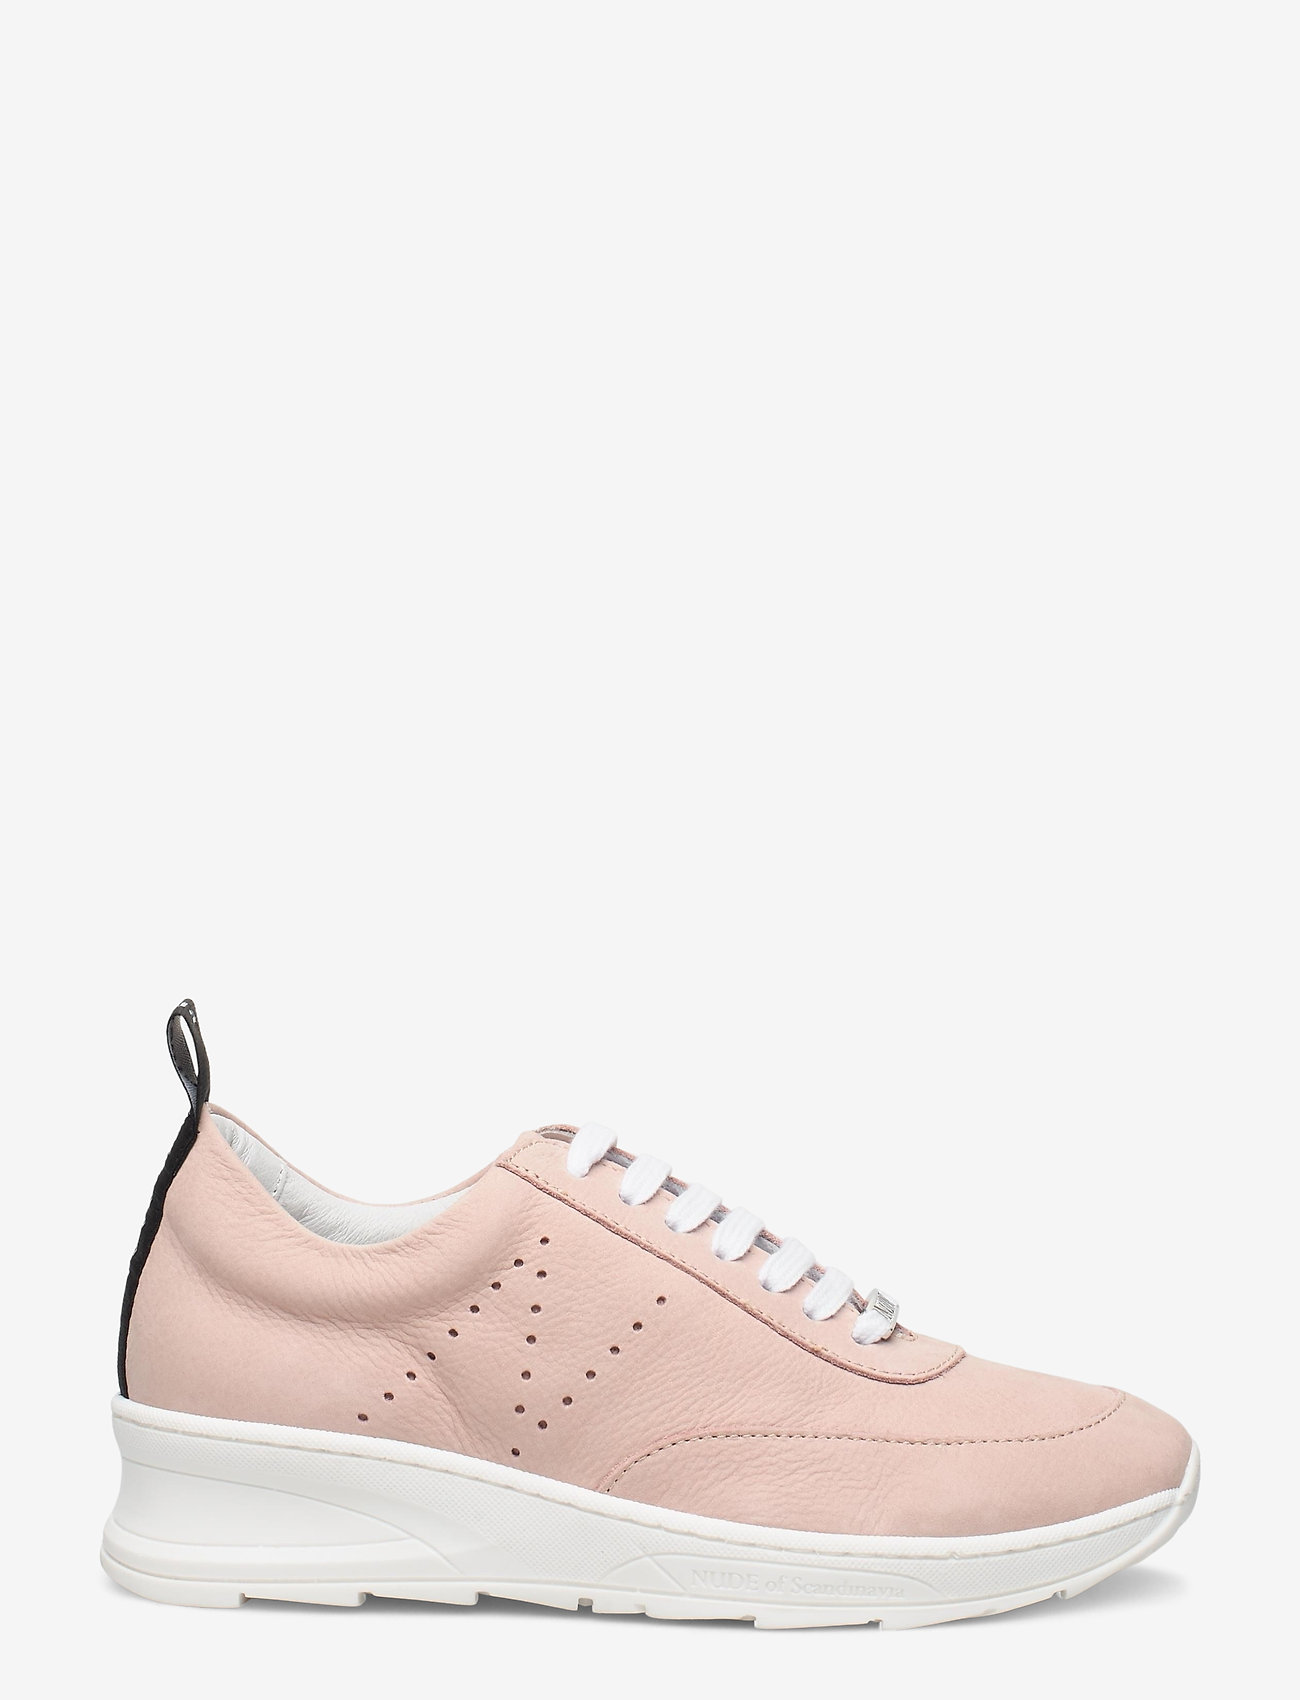 Nude of Scandinavia - PEGGY - låga sneakers - longbeach / silver pink - 1